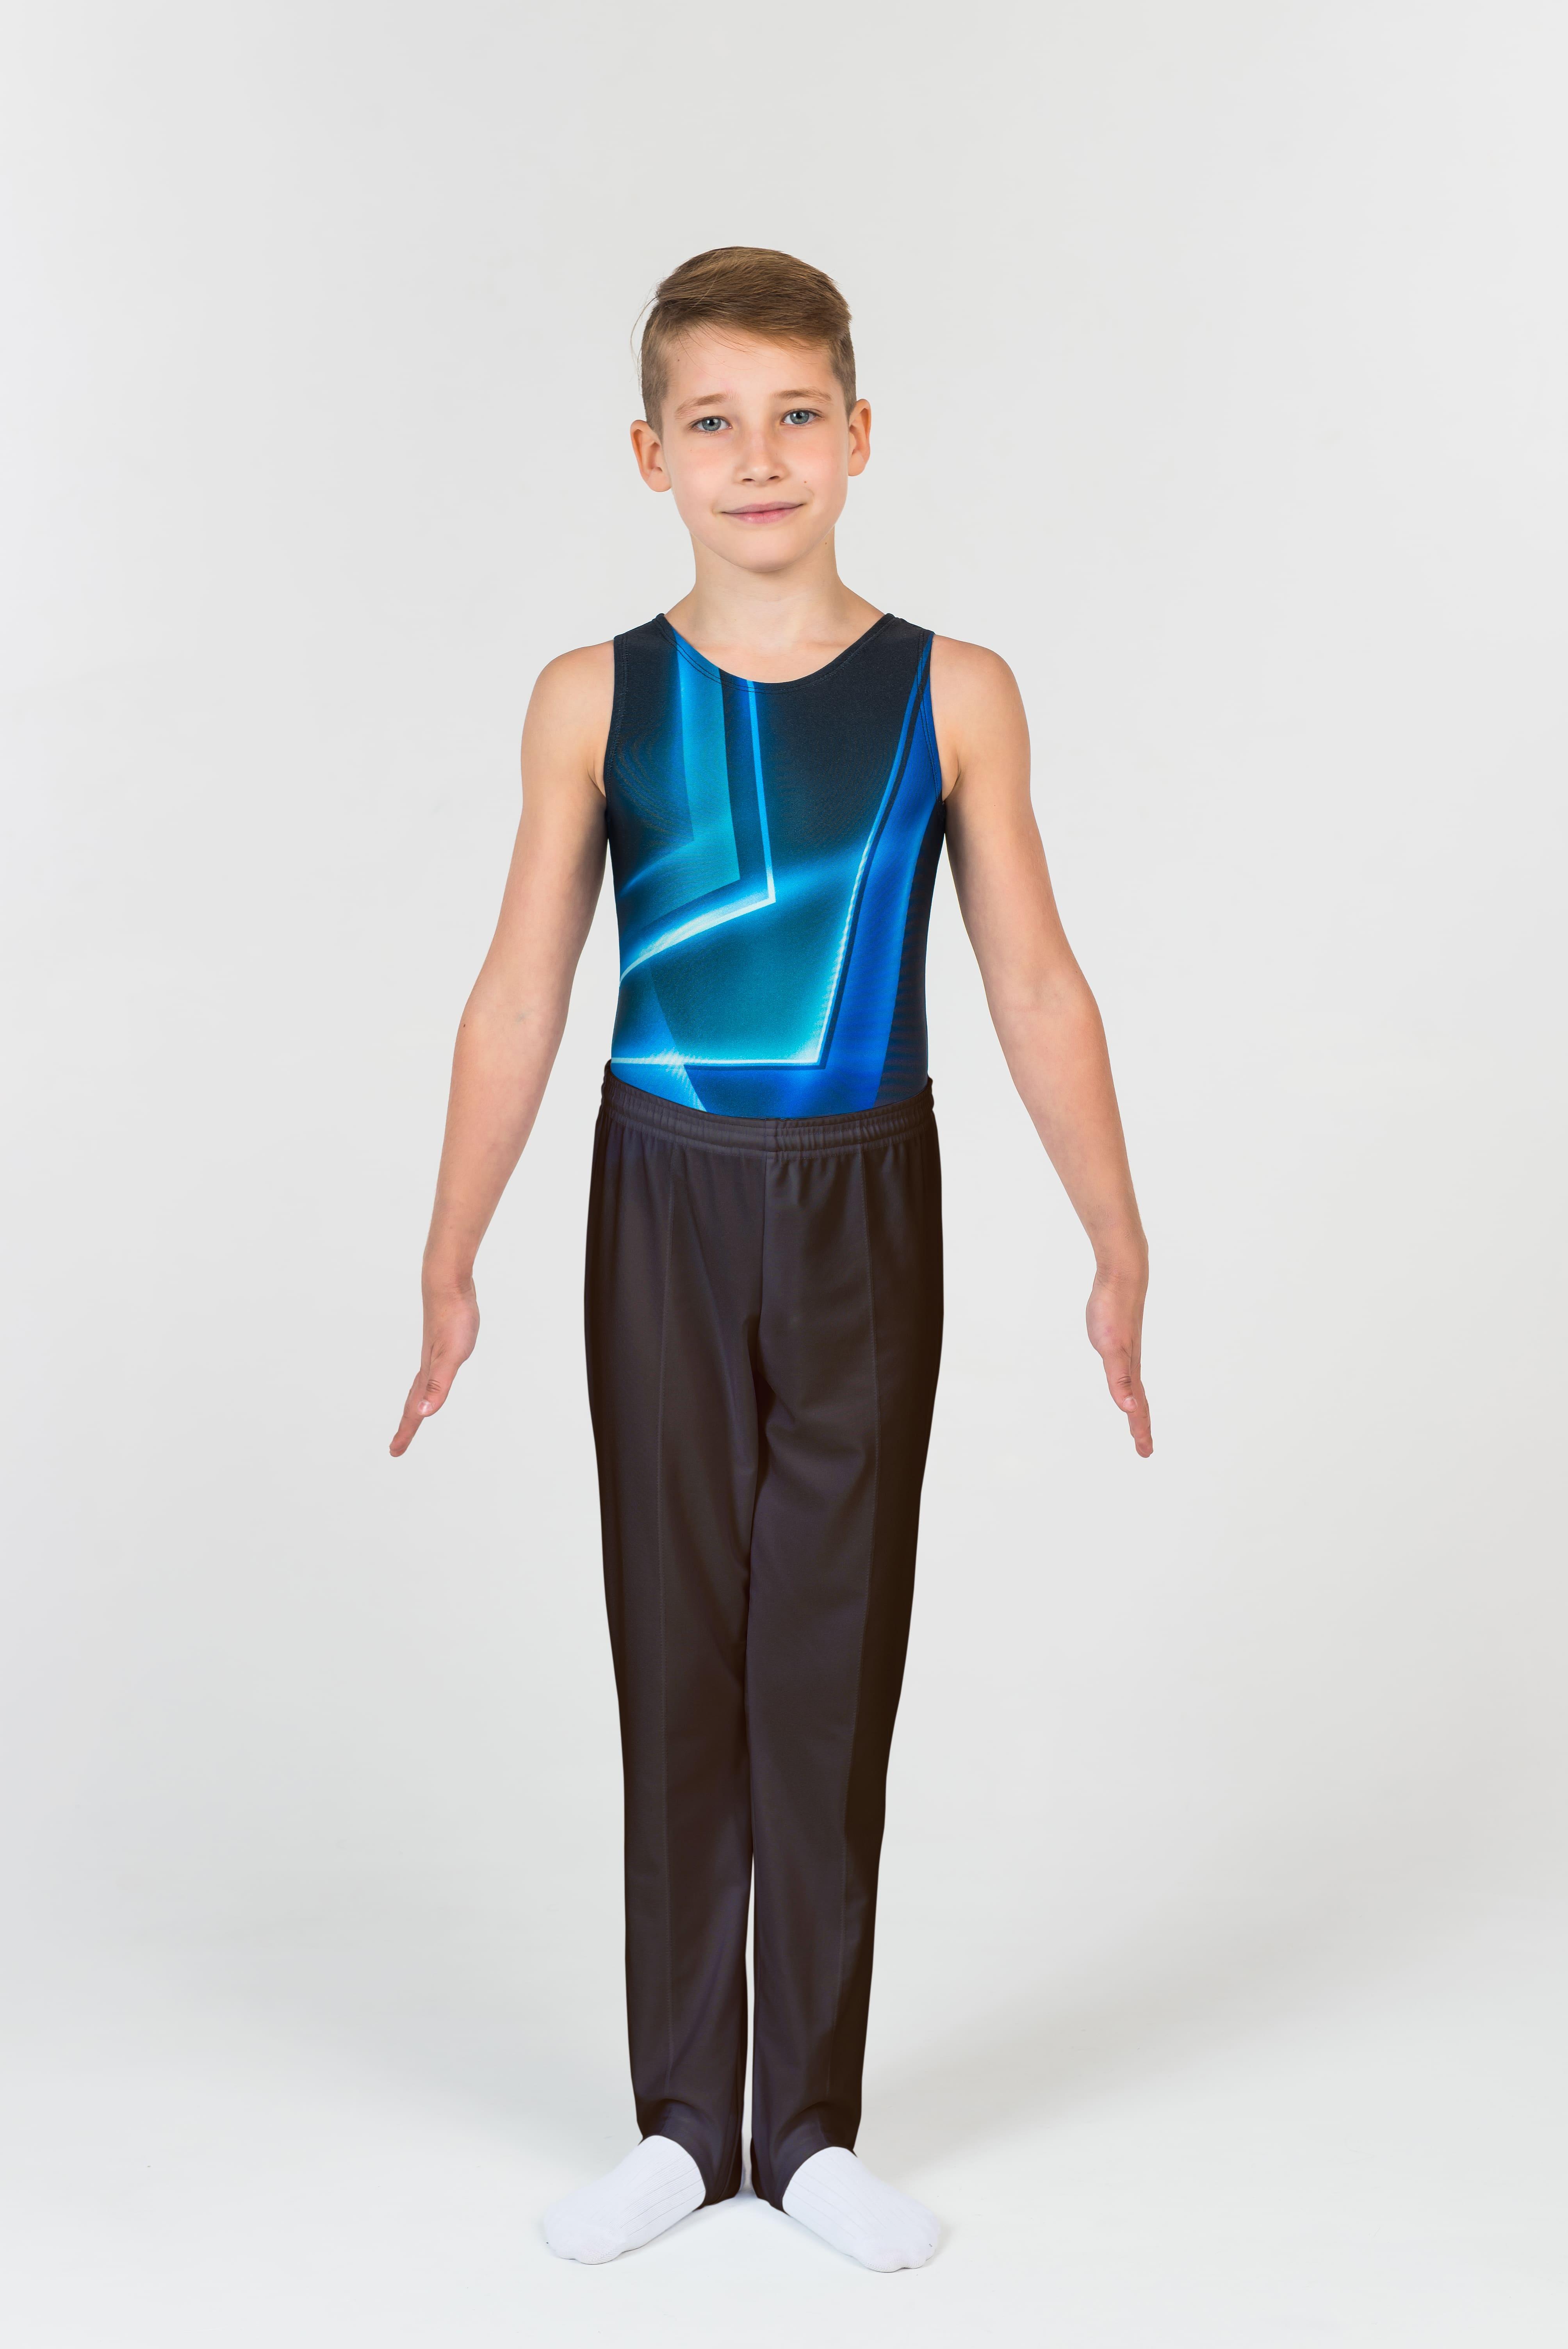 Men's Leotards, Gymnastic pants (male), pic 3